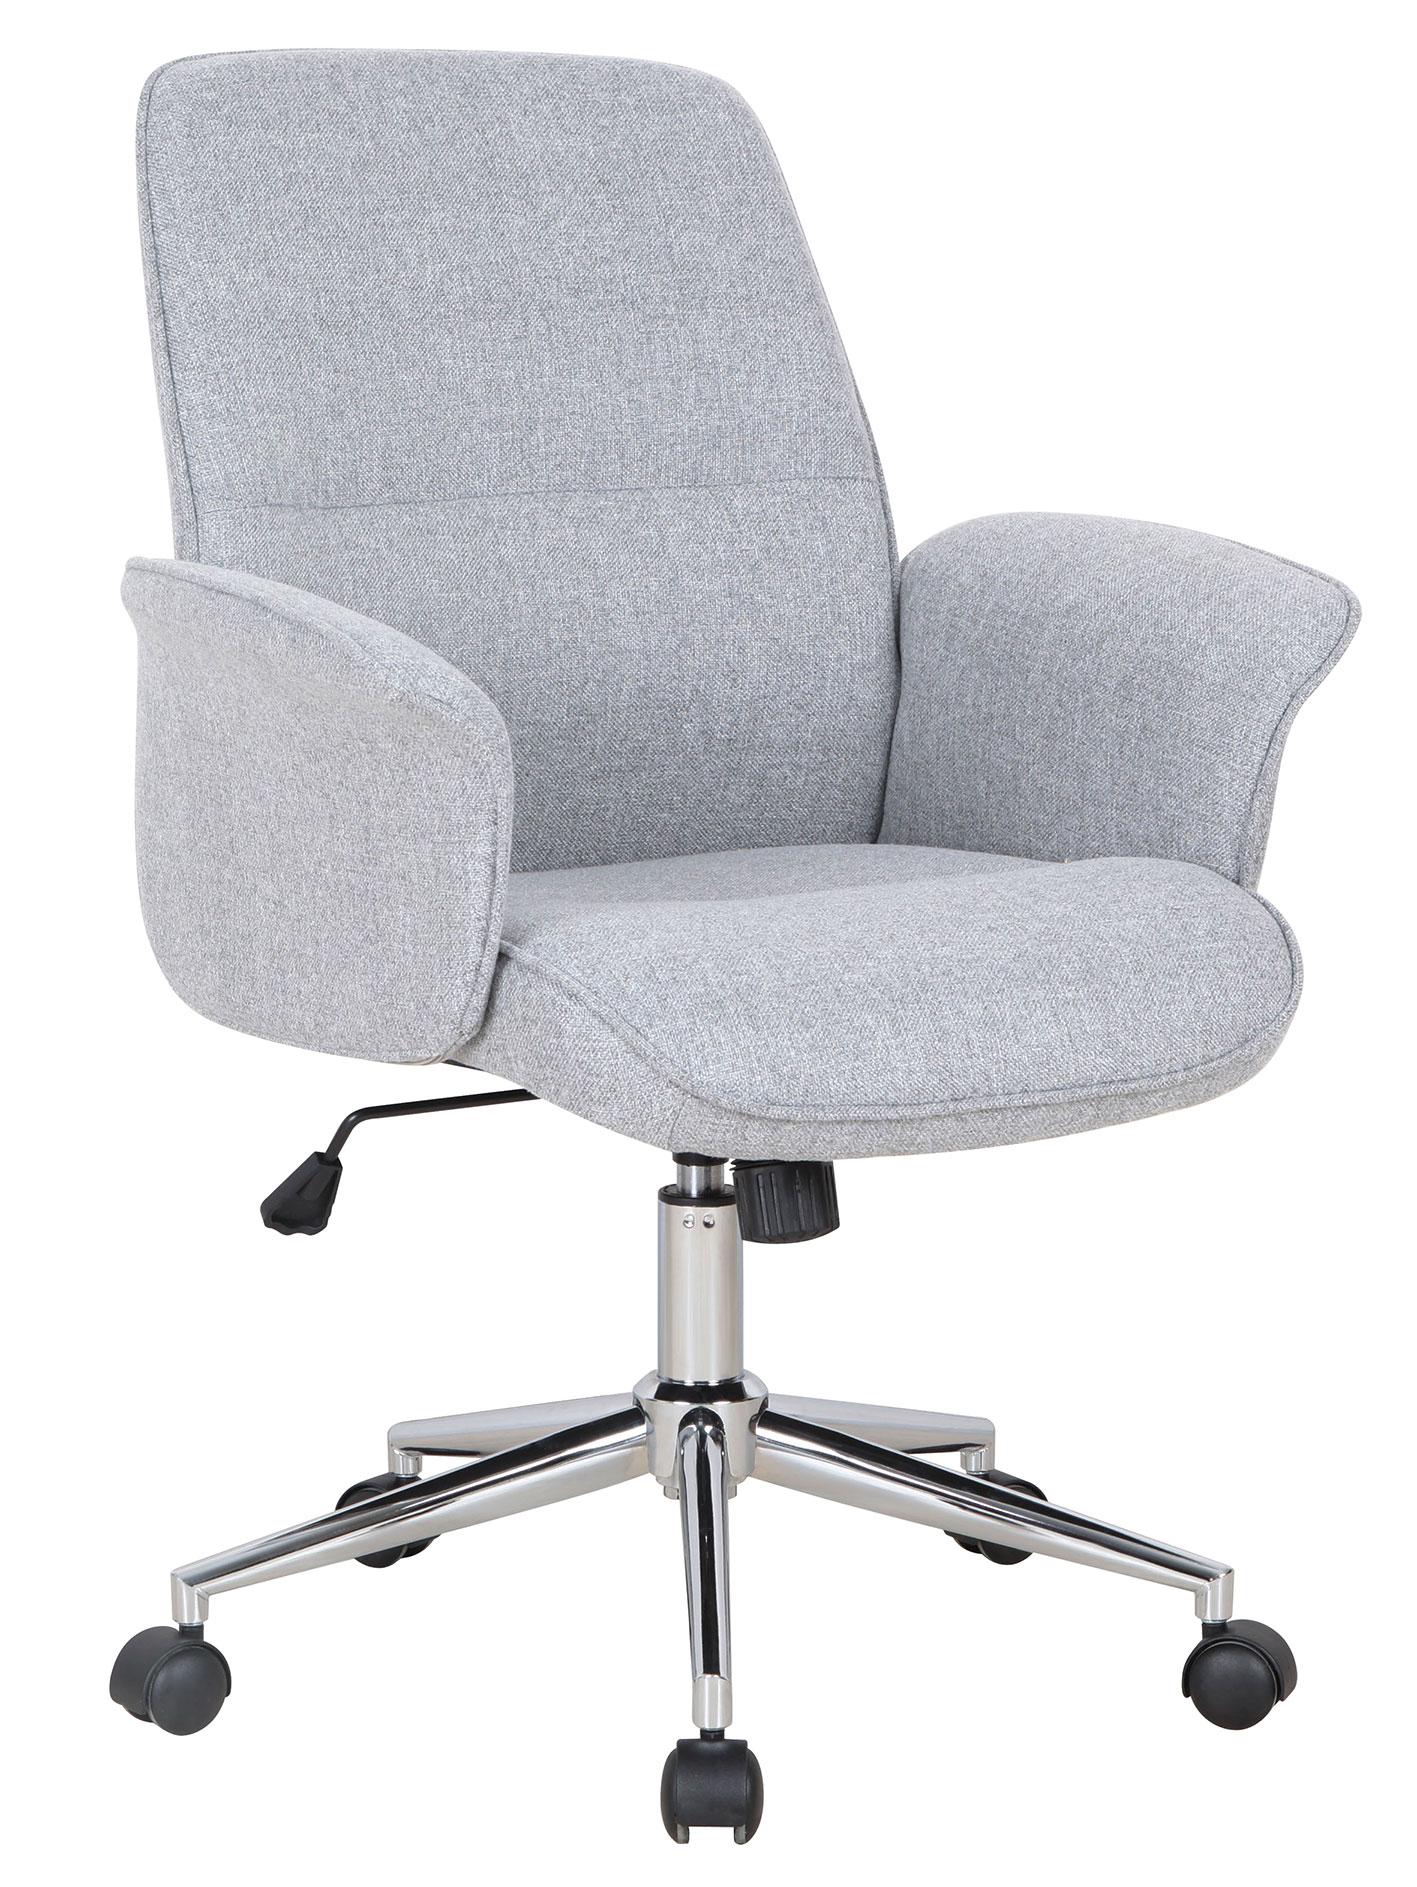 chair cs furniture office seating desk chairs cobi mesh task grey